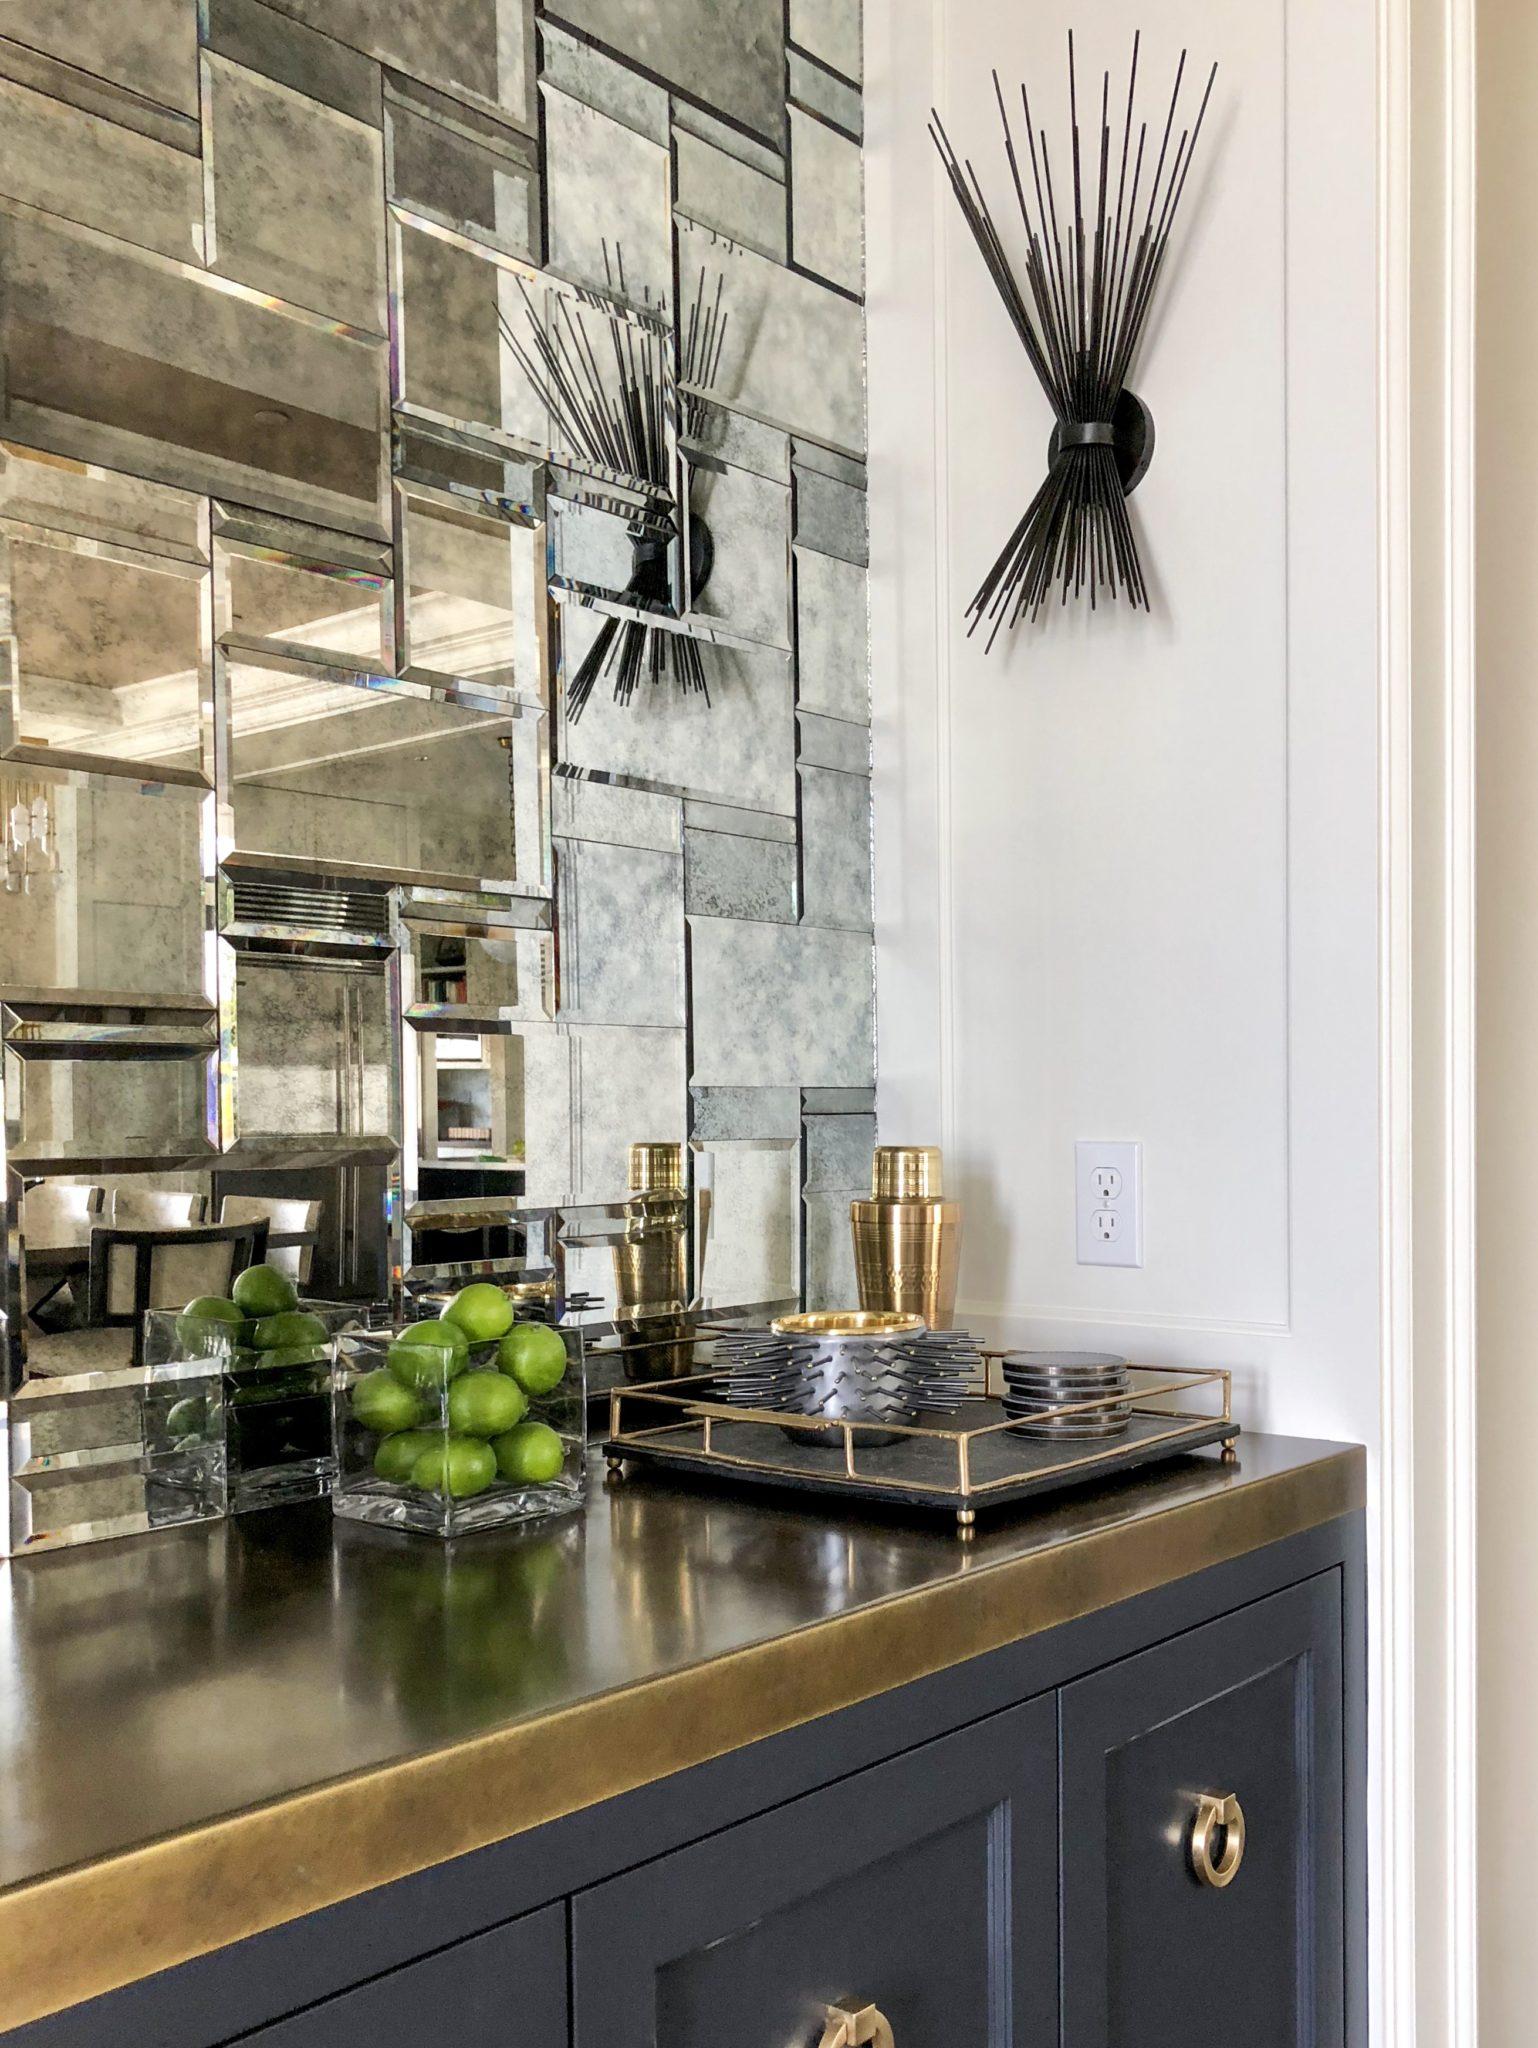 Mercer Island Dry Bar with Brass Countertop and Mosaic Mirror Tile Backsplash by LeeAnn Baker Interiors Ltd.